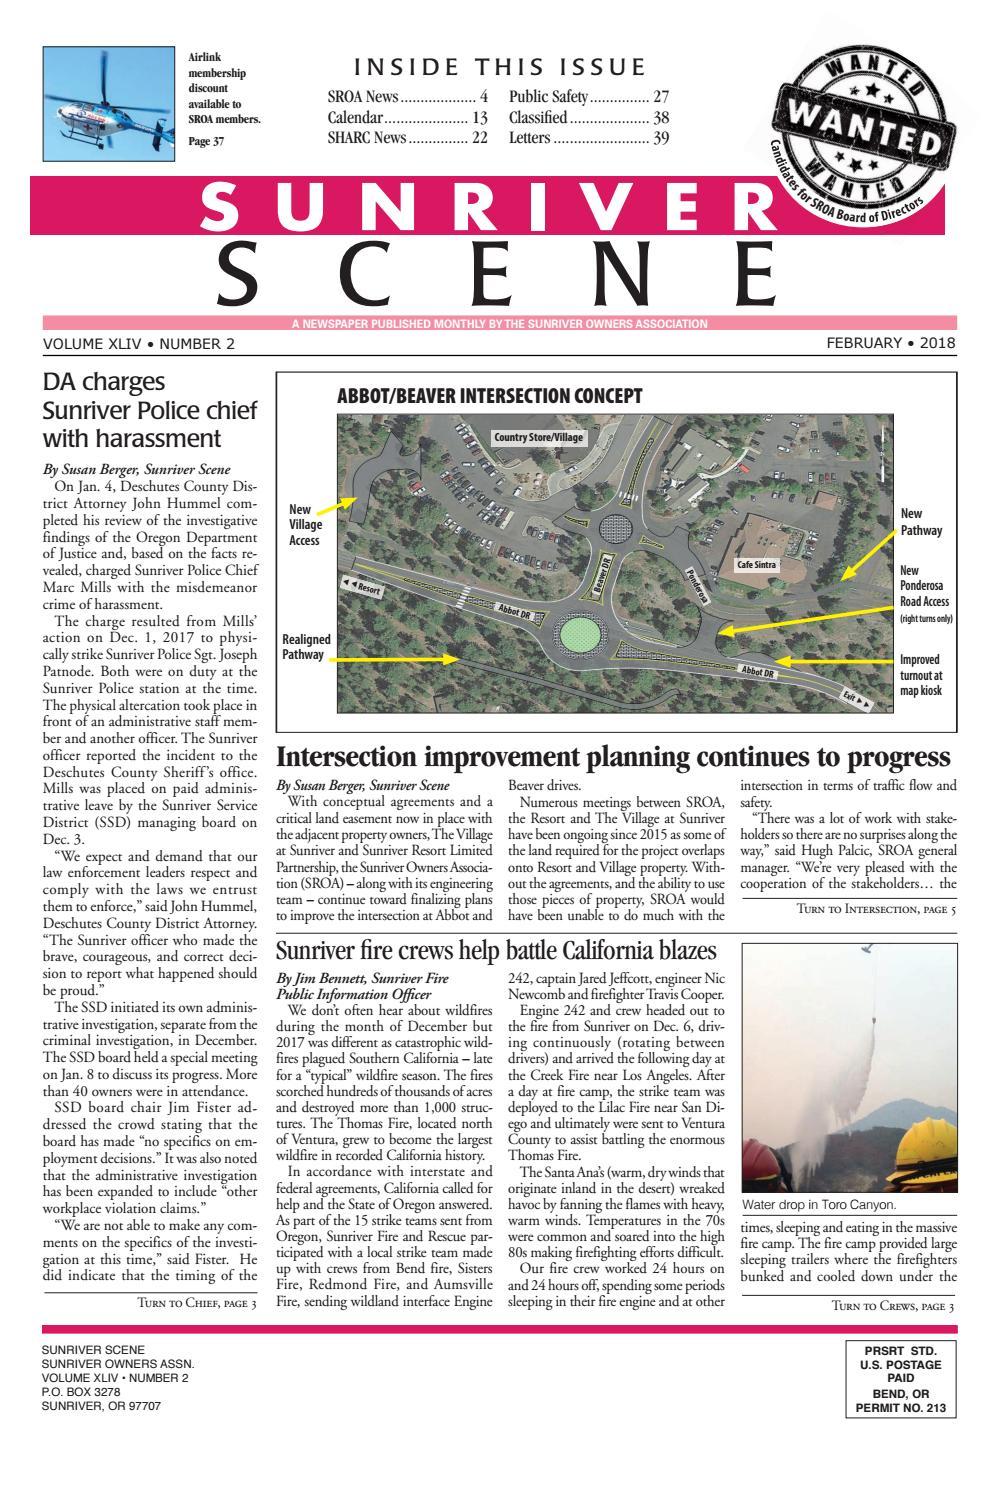 February 2018 Sunriver Scene by Sunriver Scene - issuu